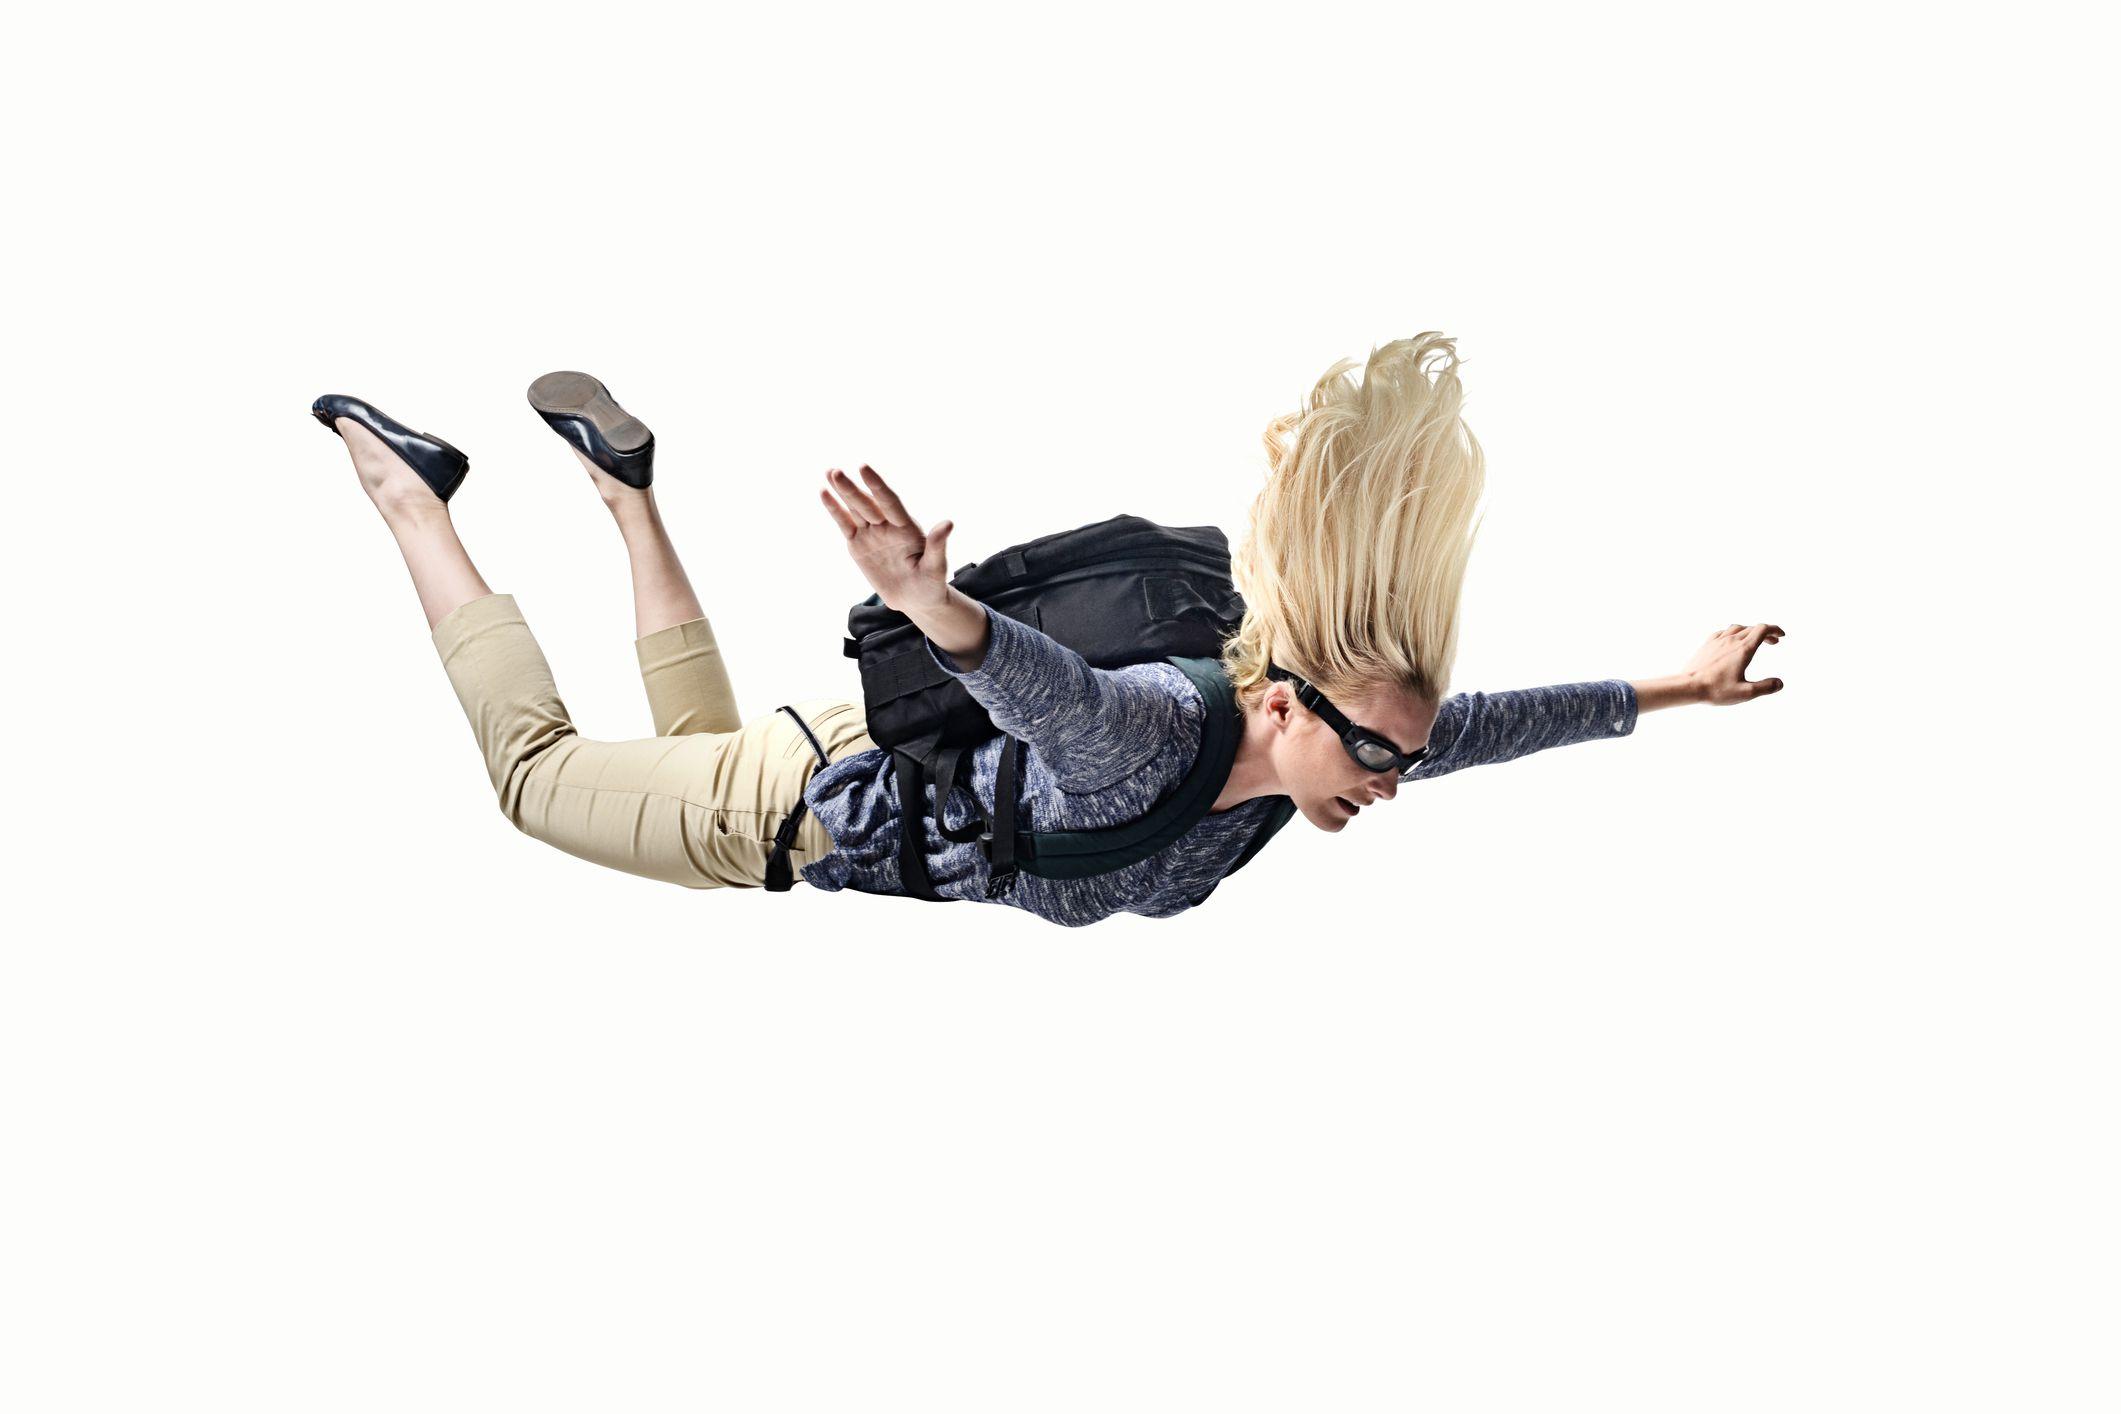 How Toyze A Free Falling Body Problem